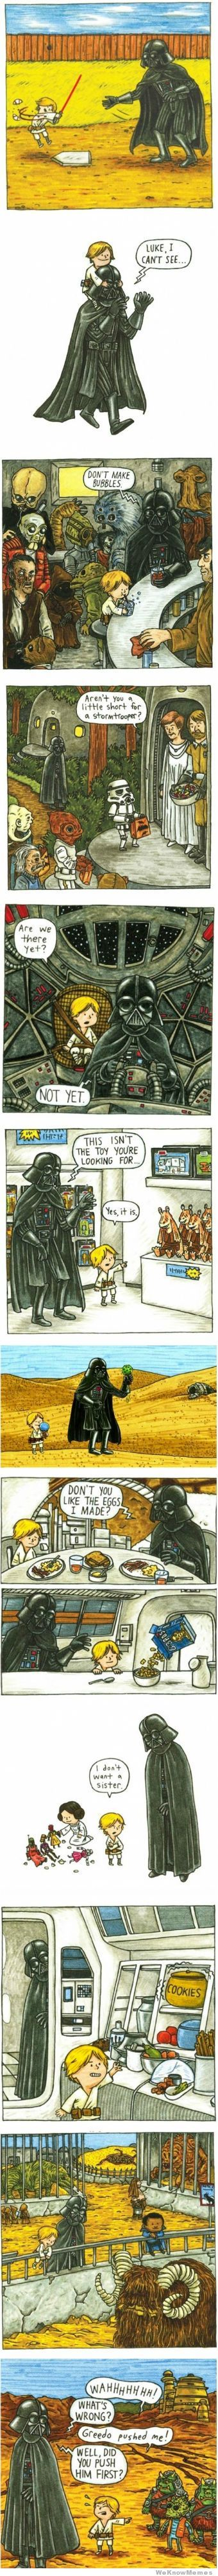 Dad of the year. Darth Vader.